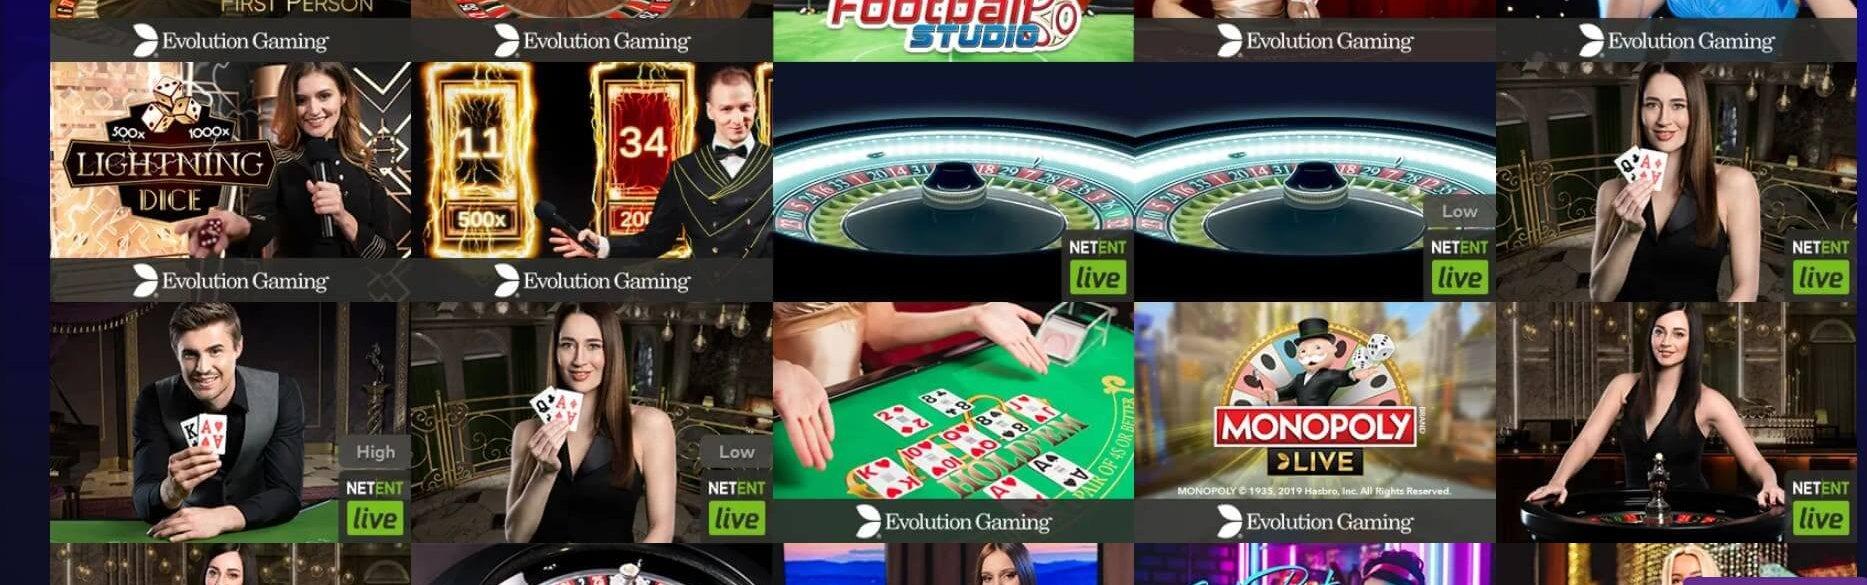 Race Casino bjuder på 85 bord i live casino-delen